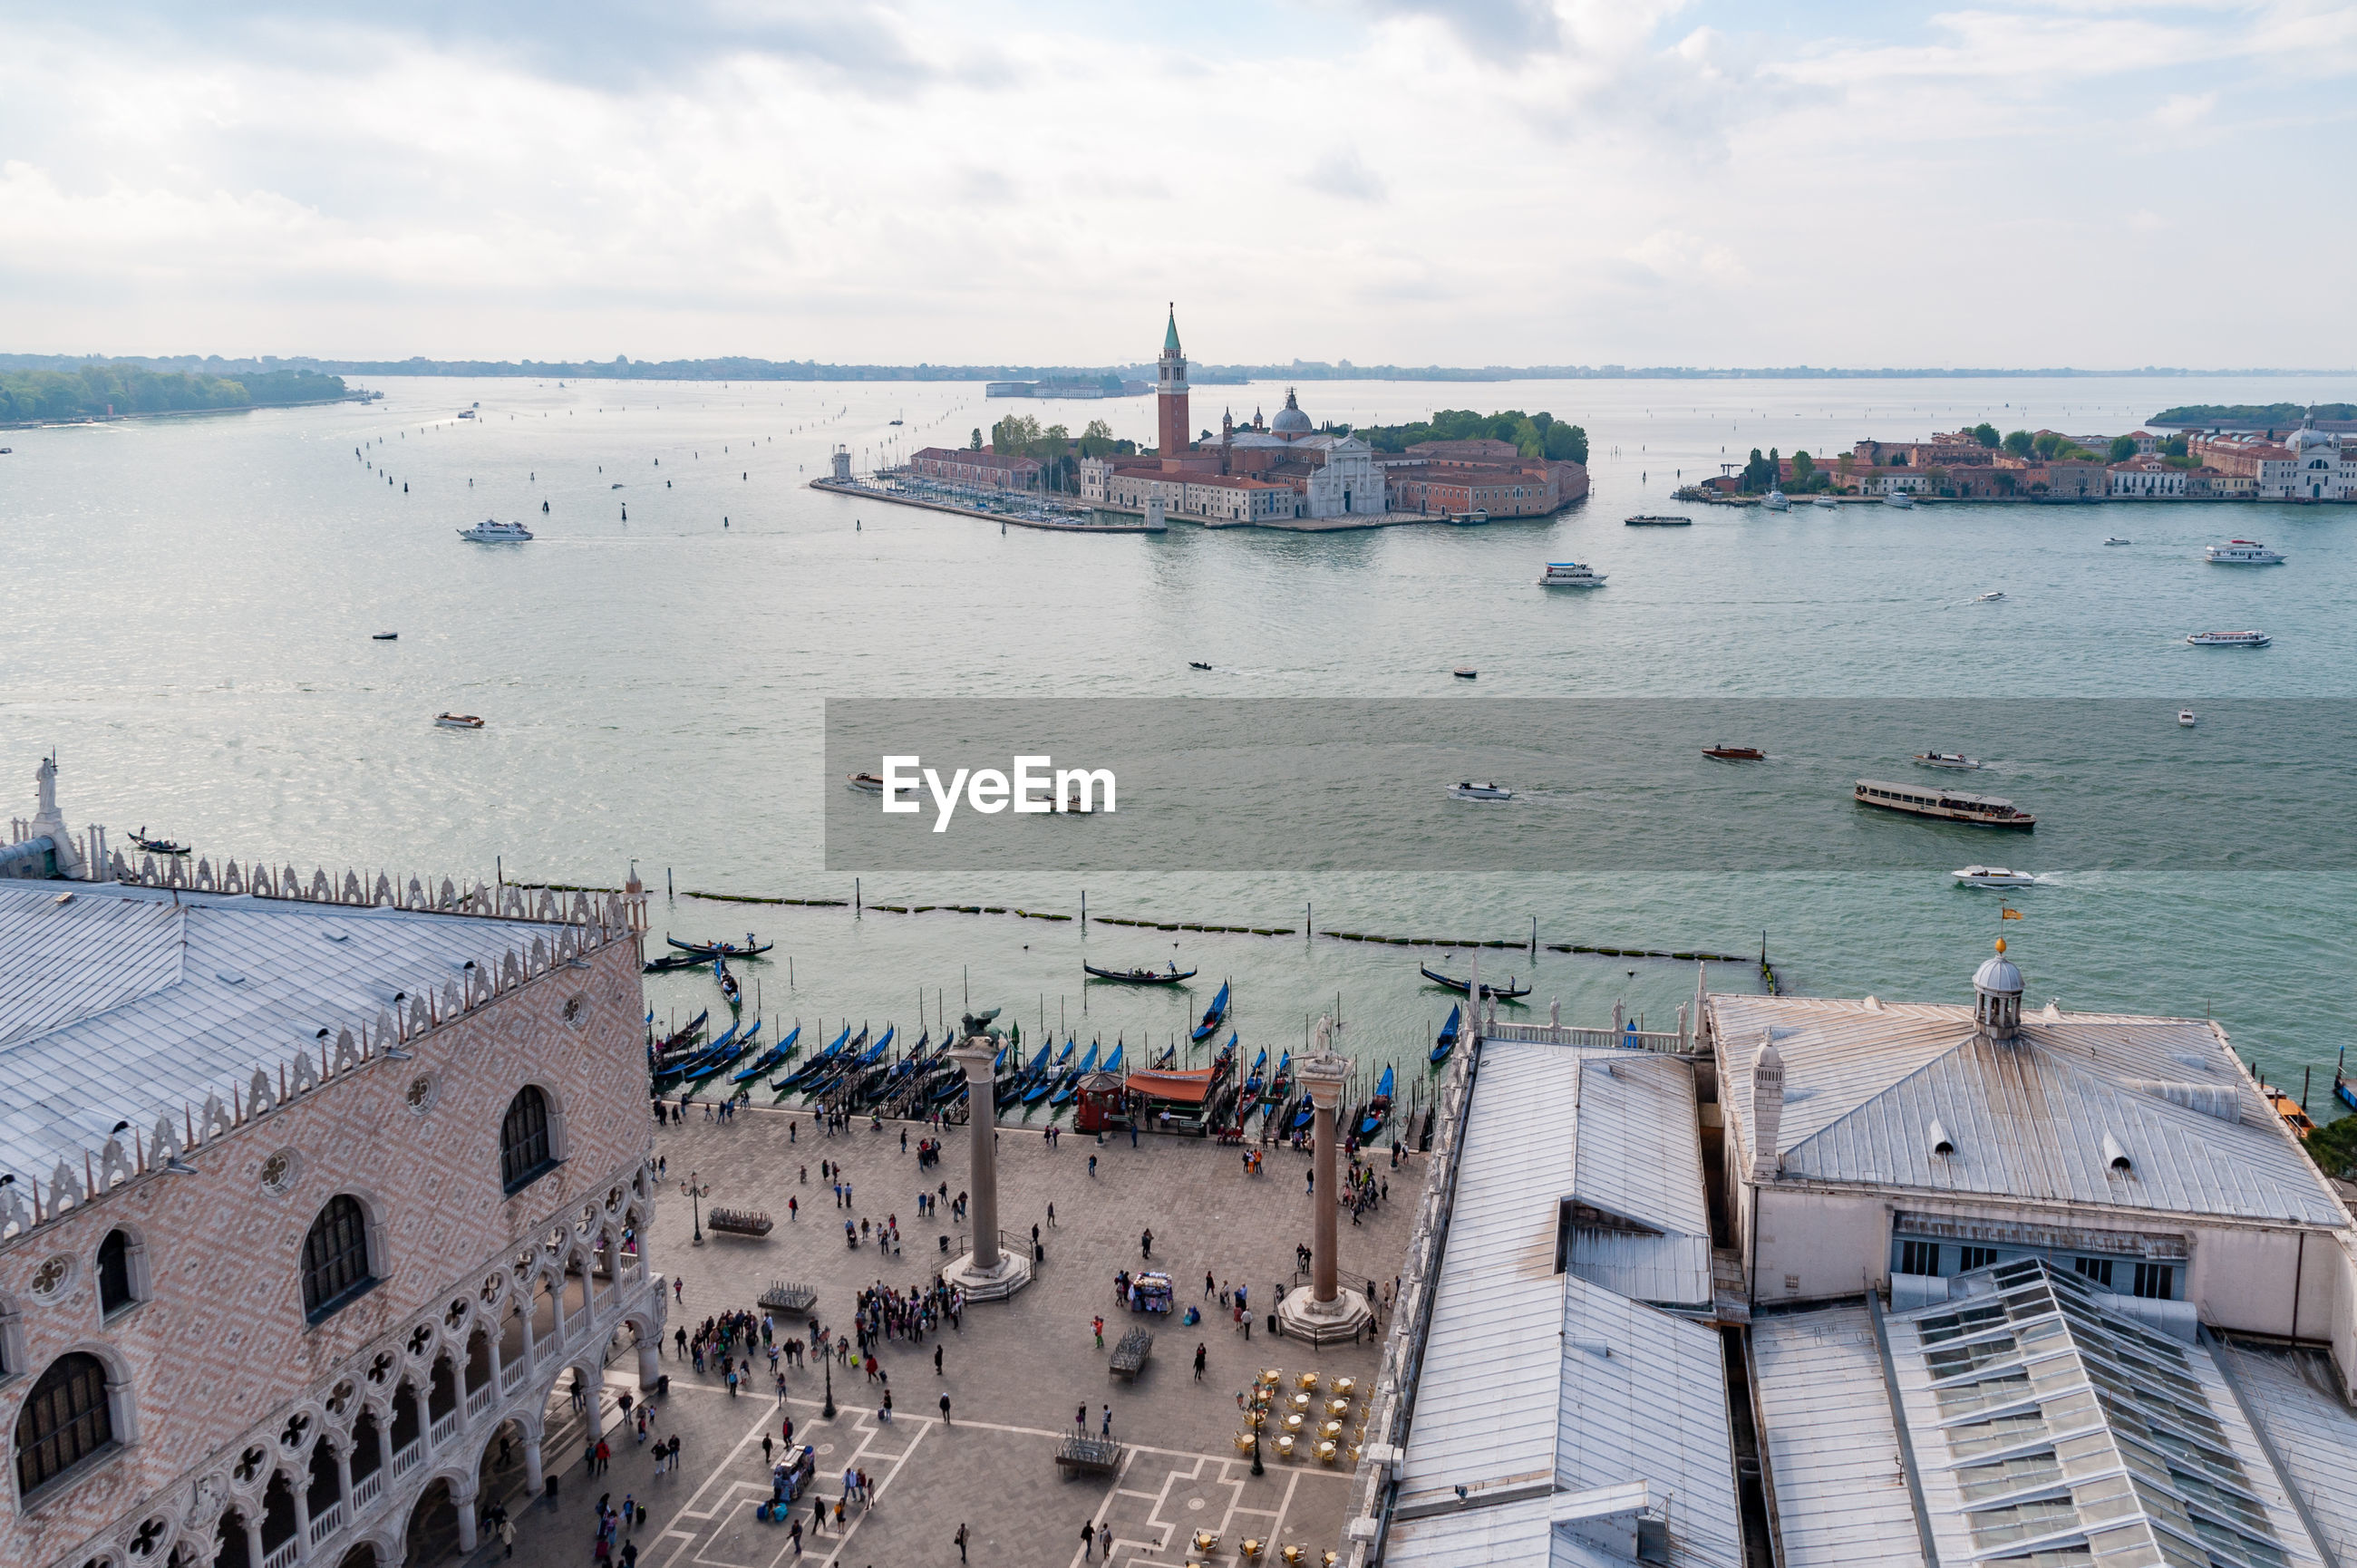 Venetian lagoon from st mark's campanile